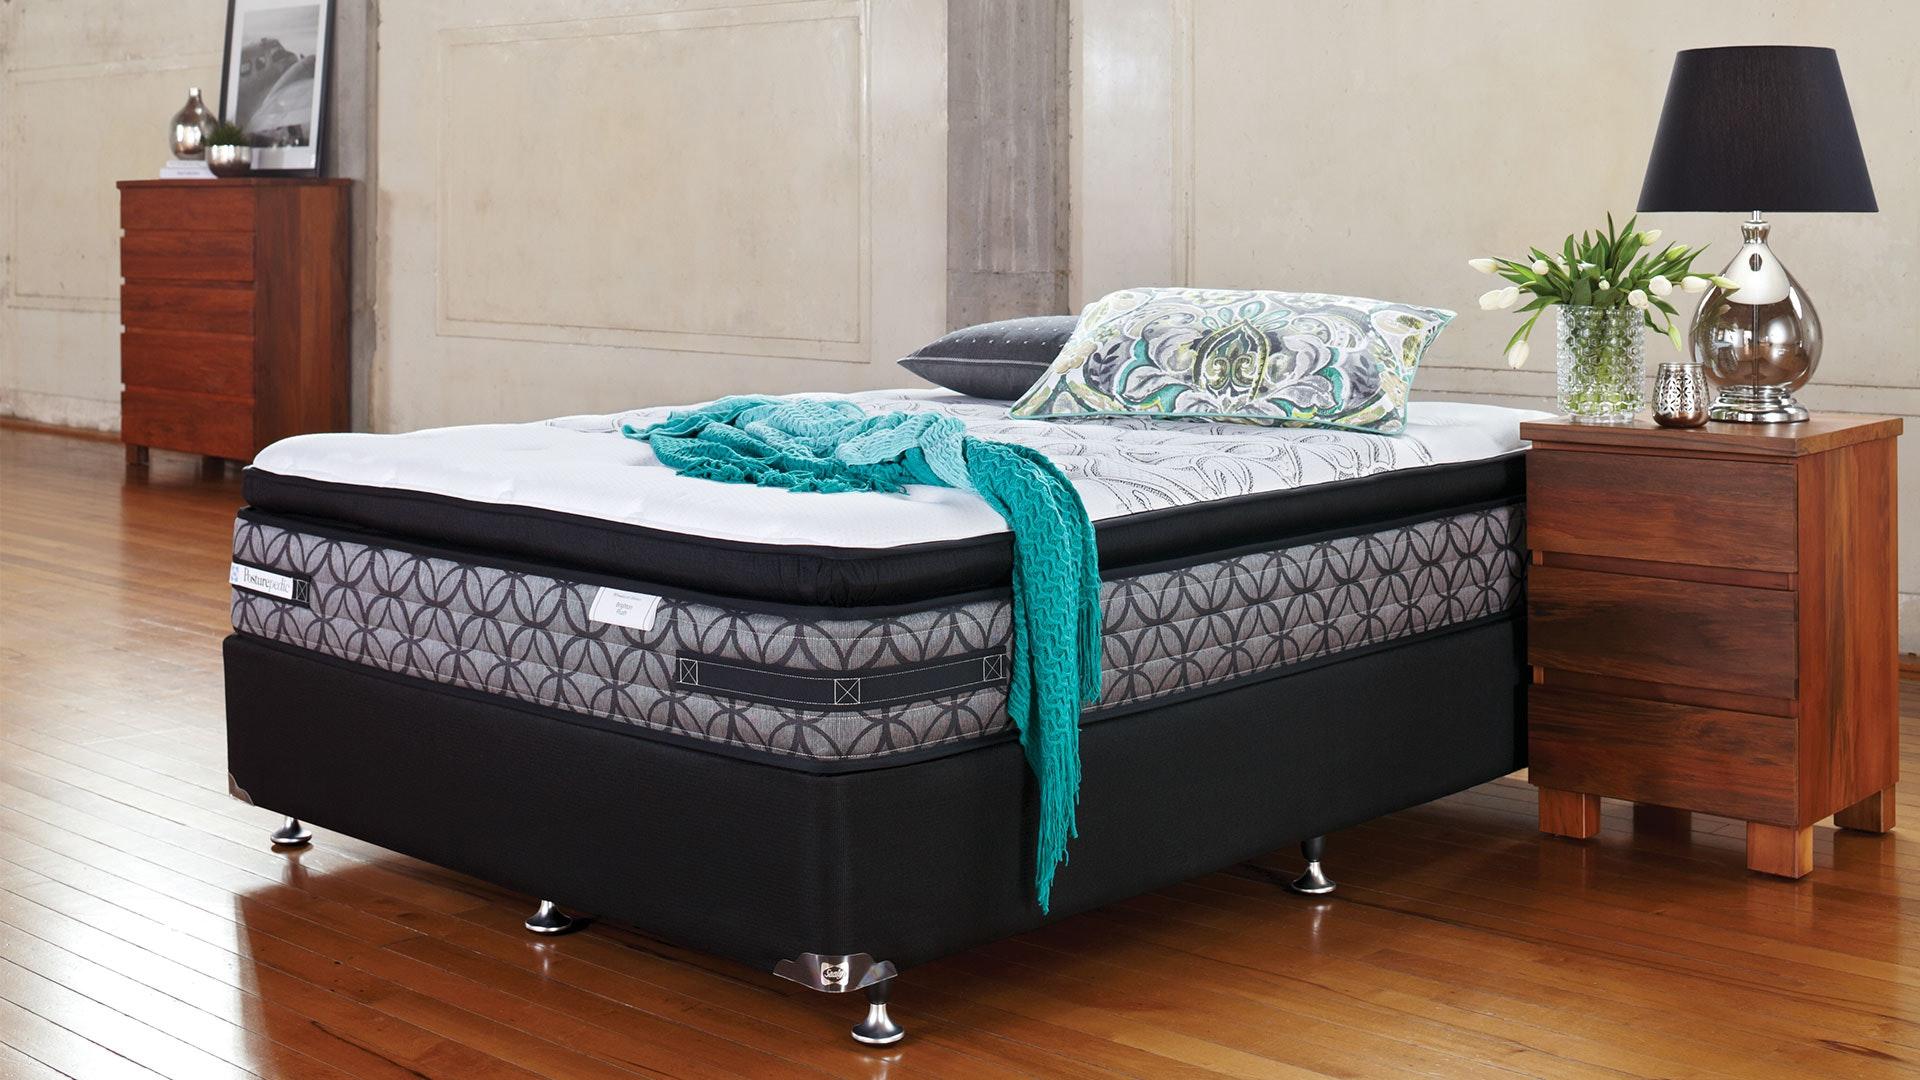 Brighton Plush Single Bed by Sealy Posturepedic